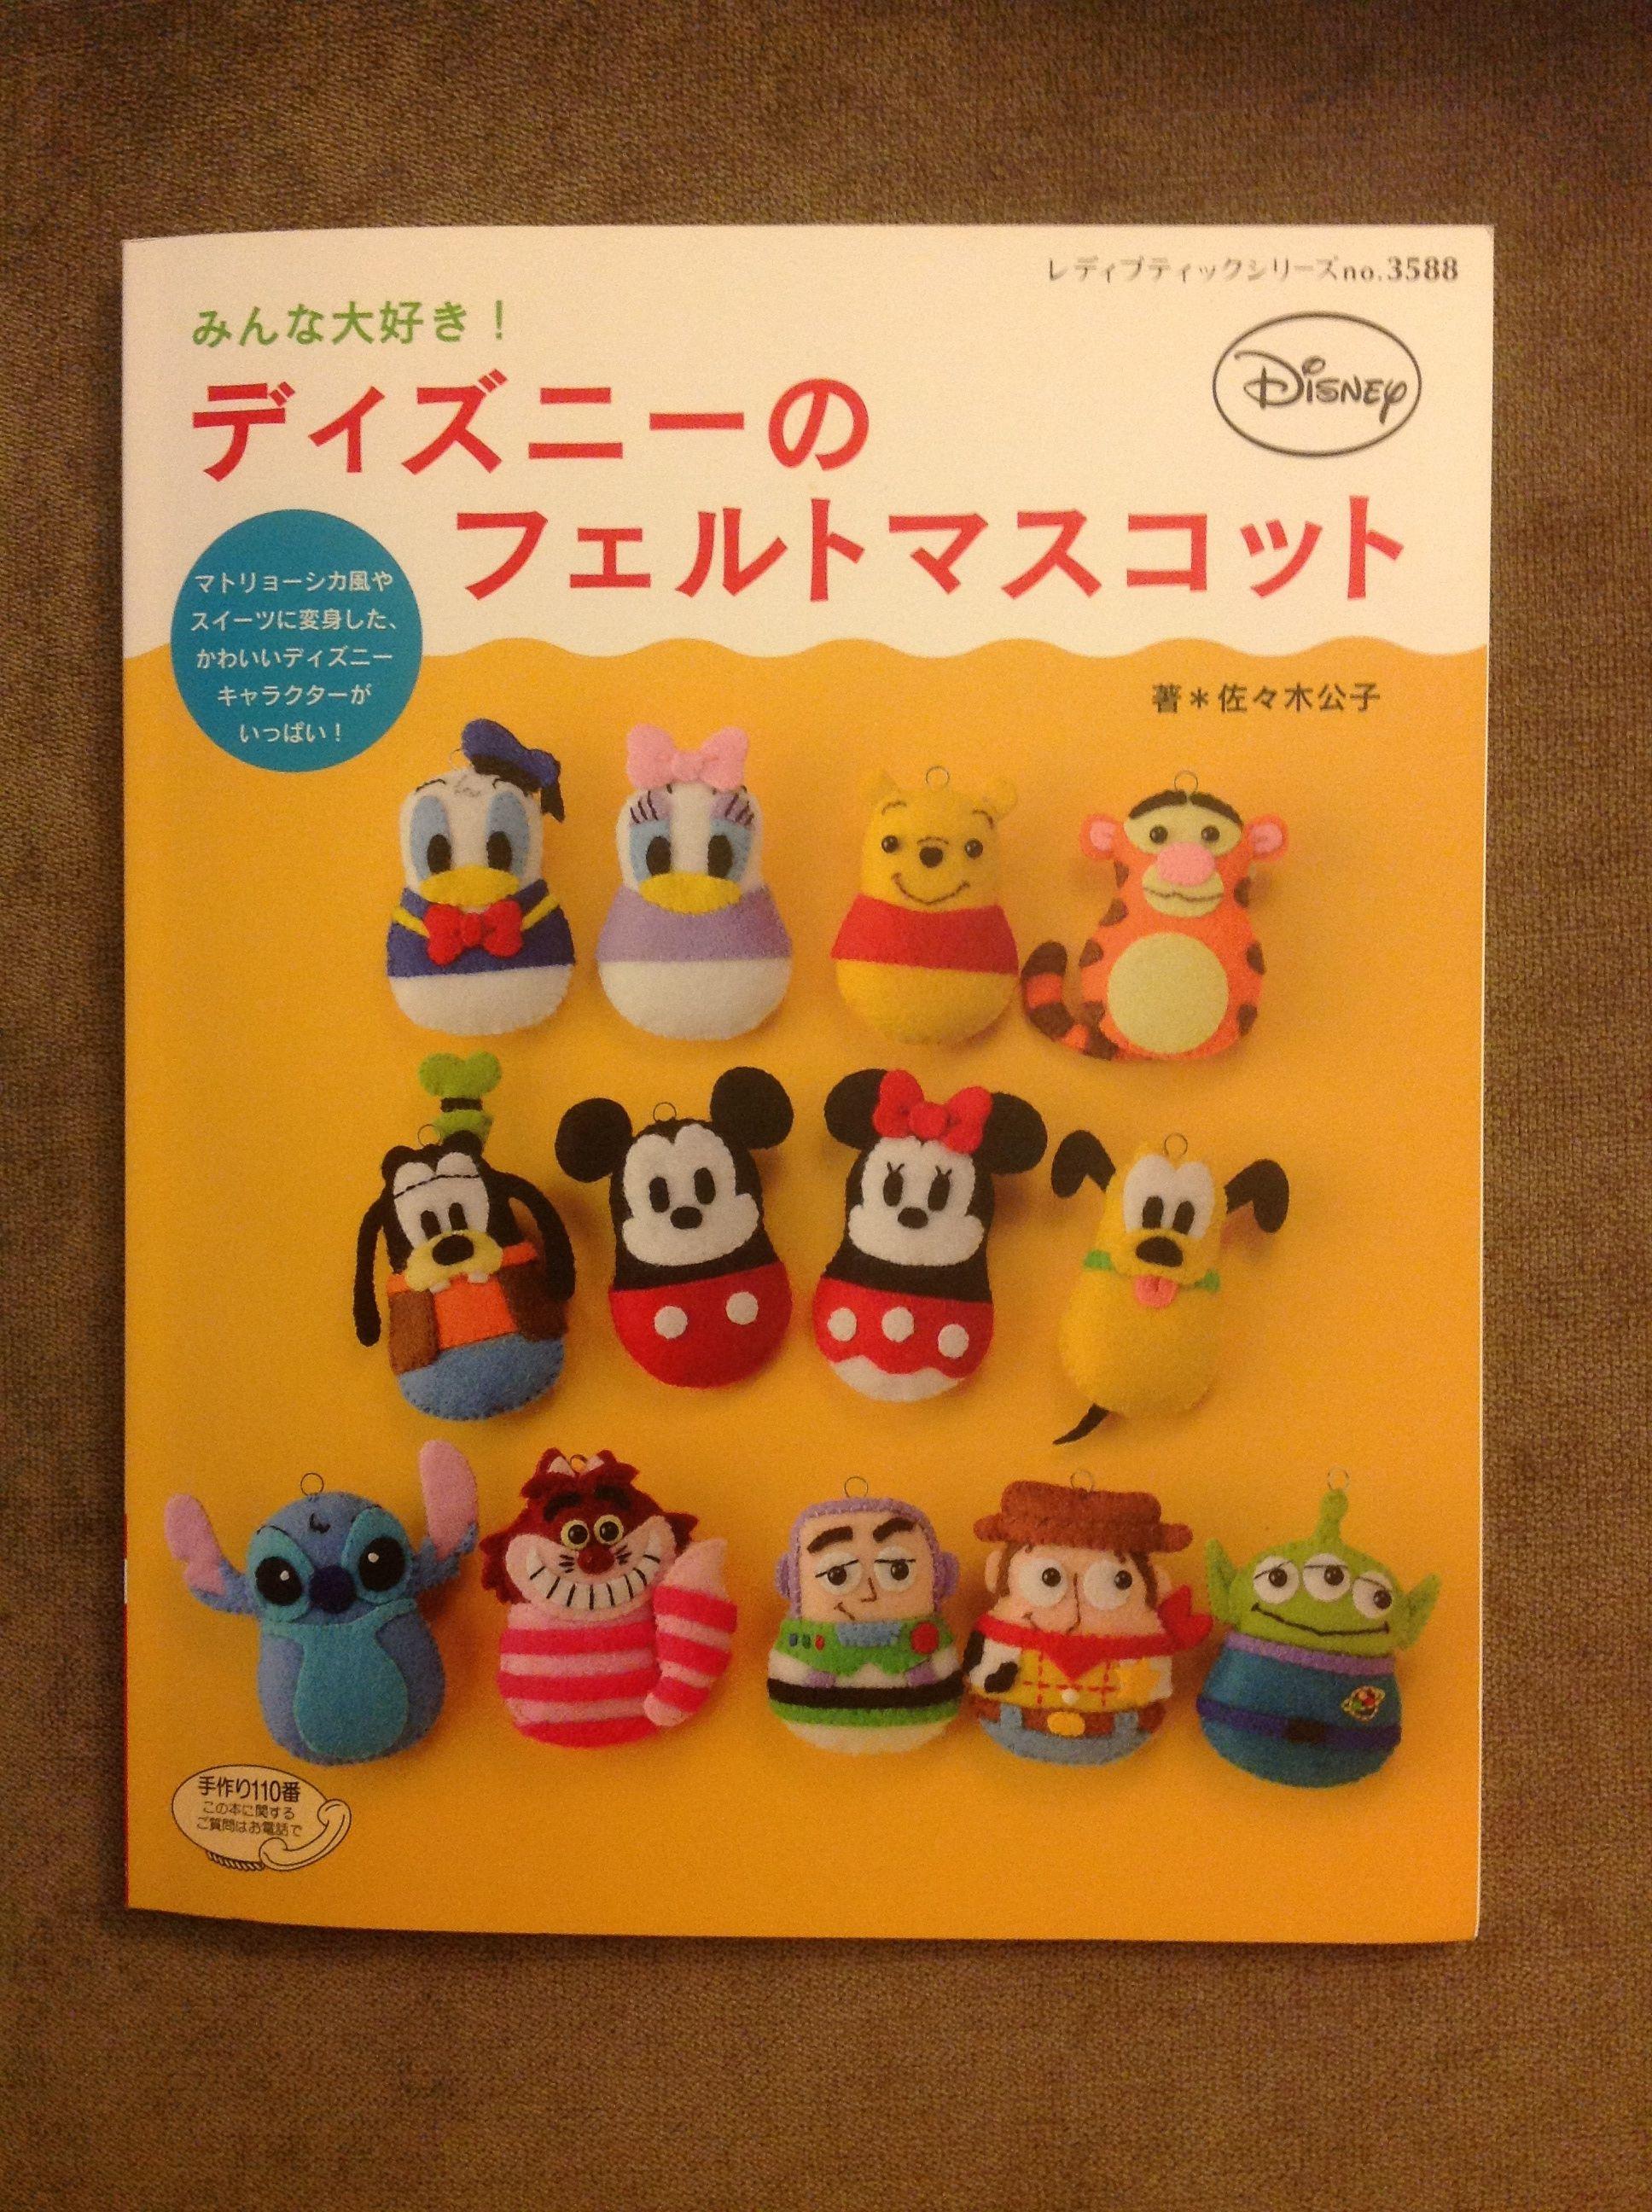 Felt craft book - Disney Felt Craft Book From Kinokuniya Bookstore